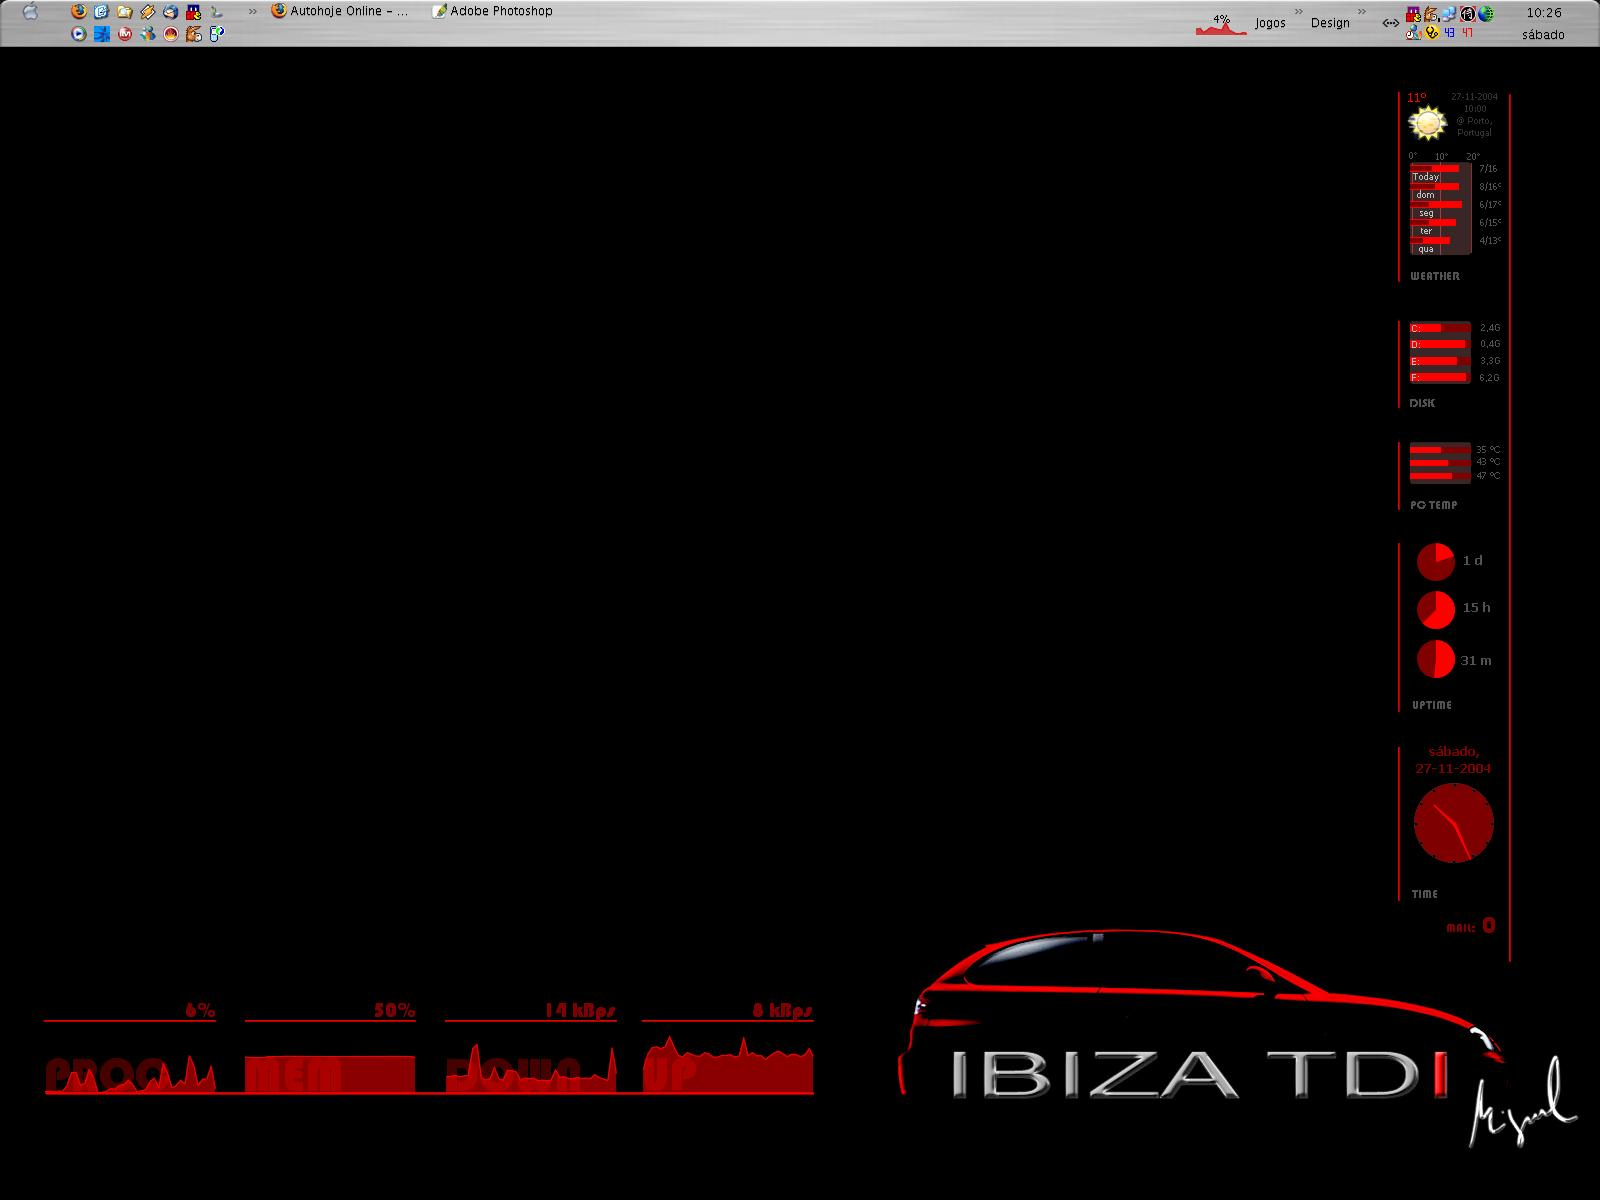 Title: IbizaTDI